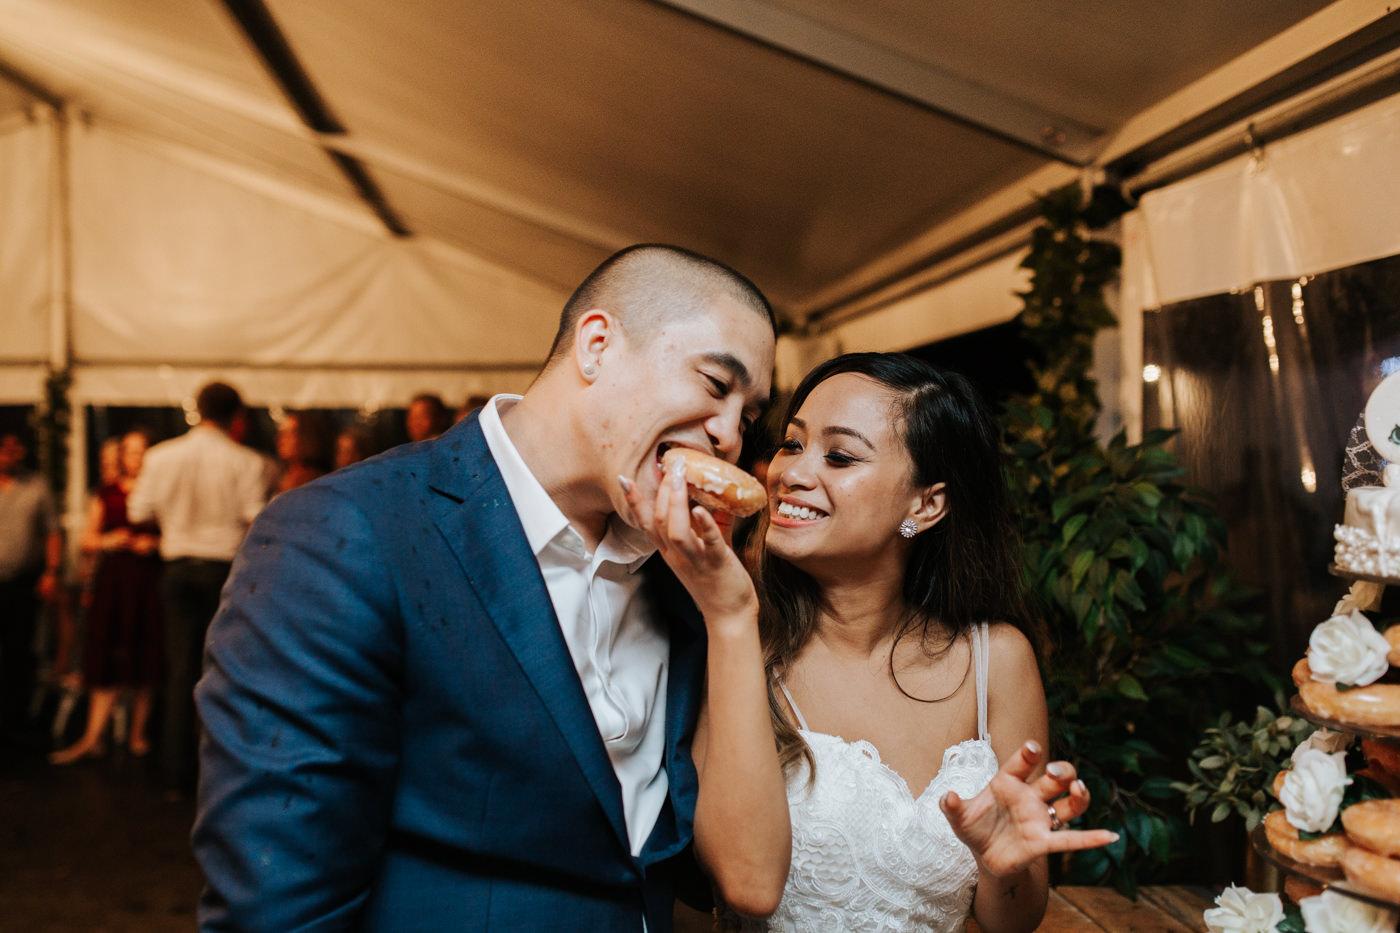 Nick & Vanezza - Fernbank Farm Wedding - Samantha Heather Photography-166.jpg